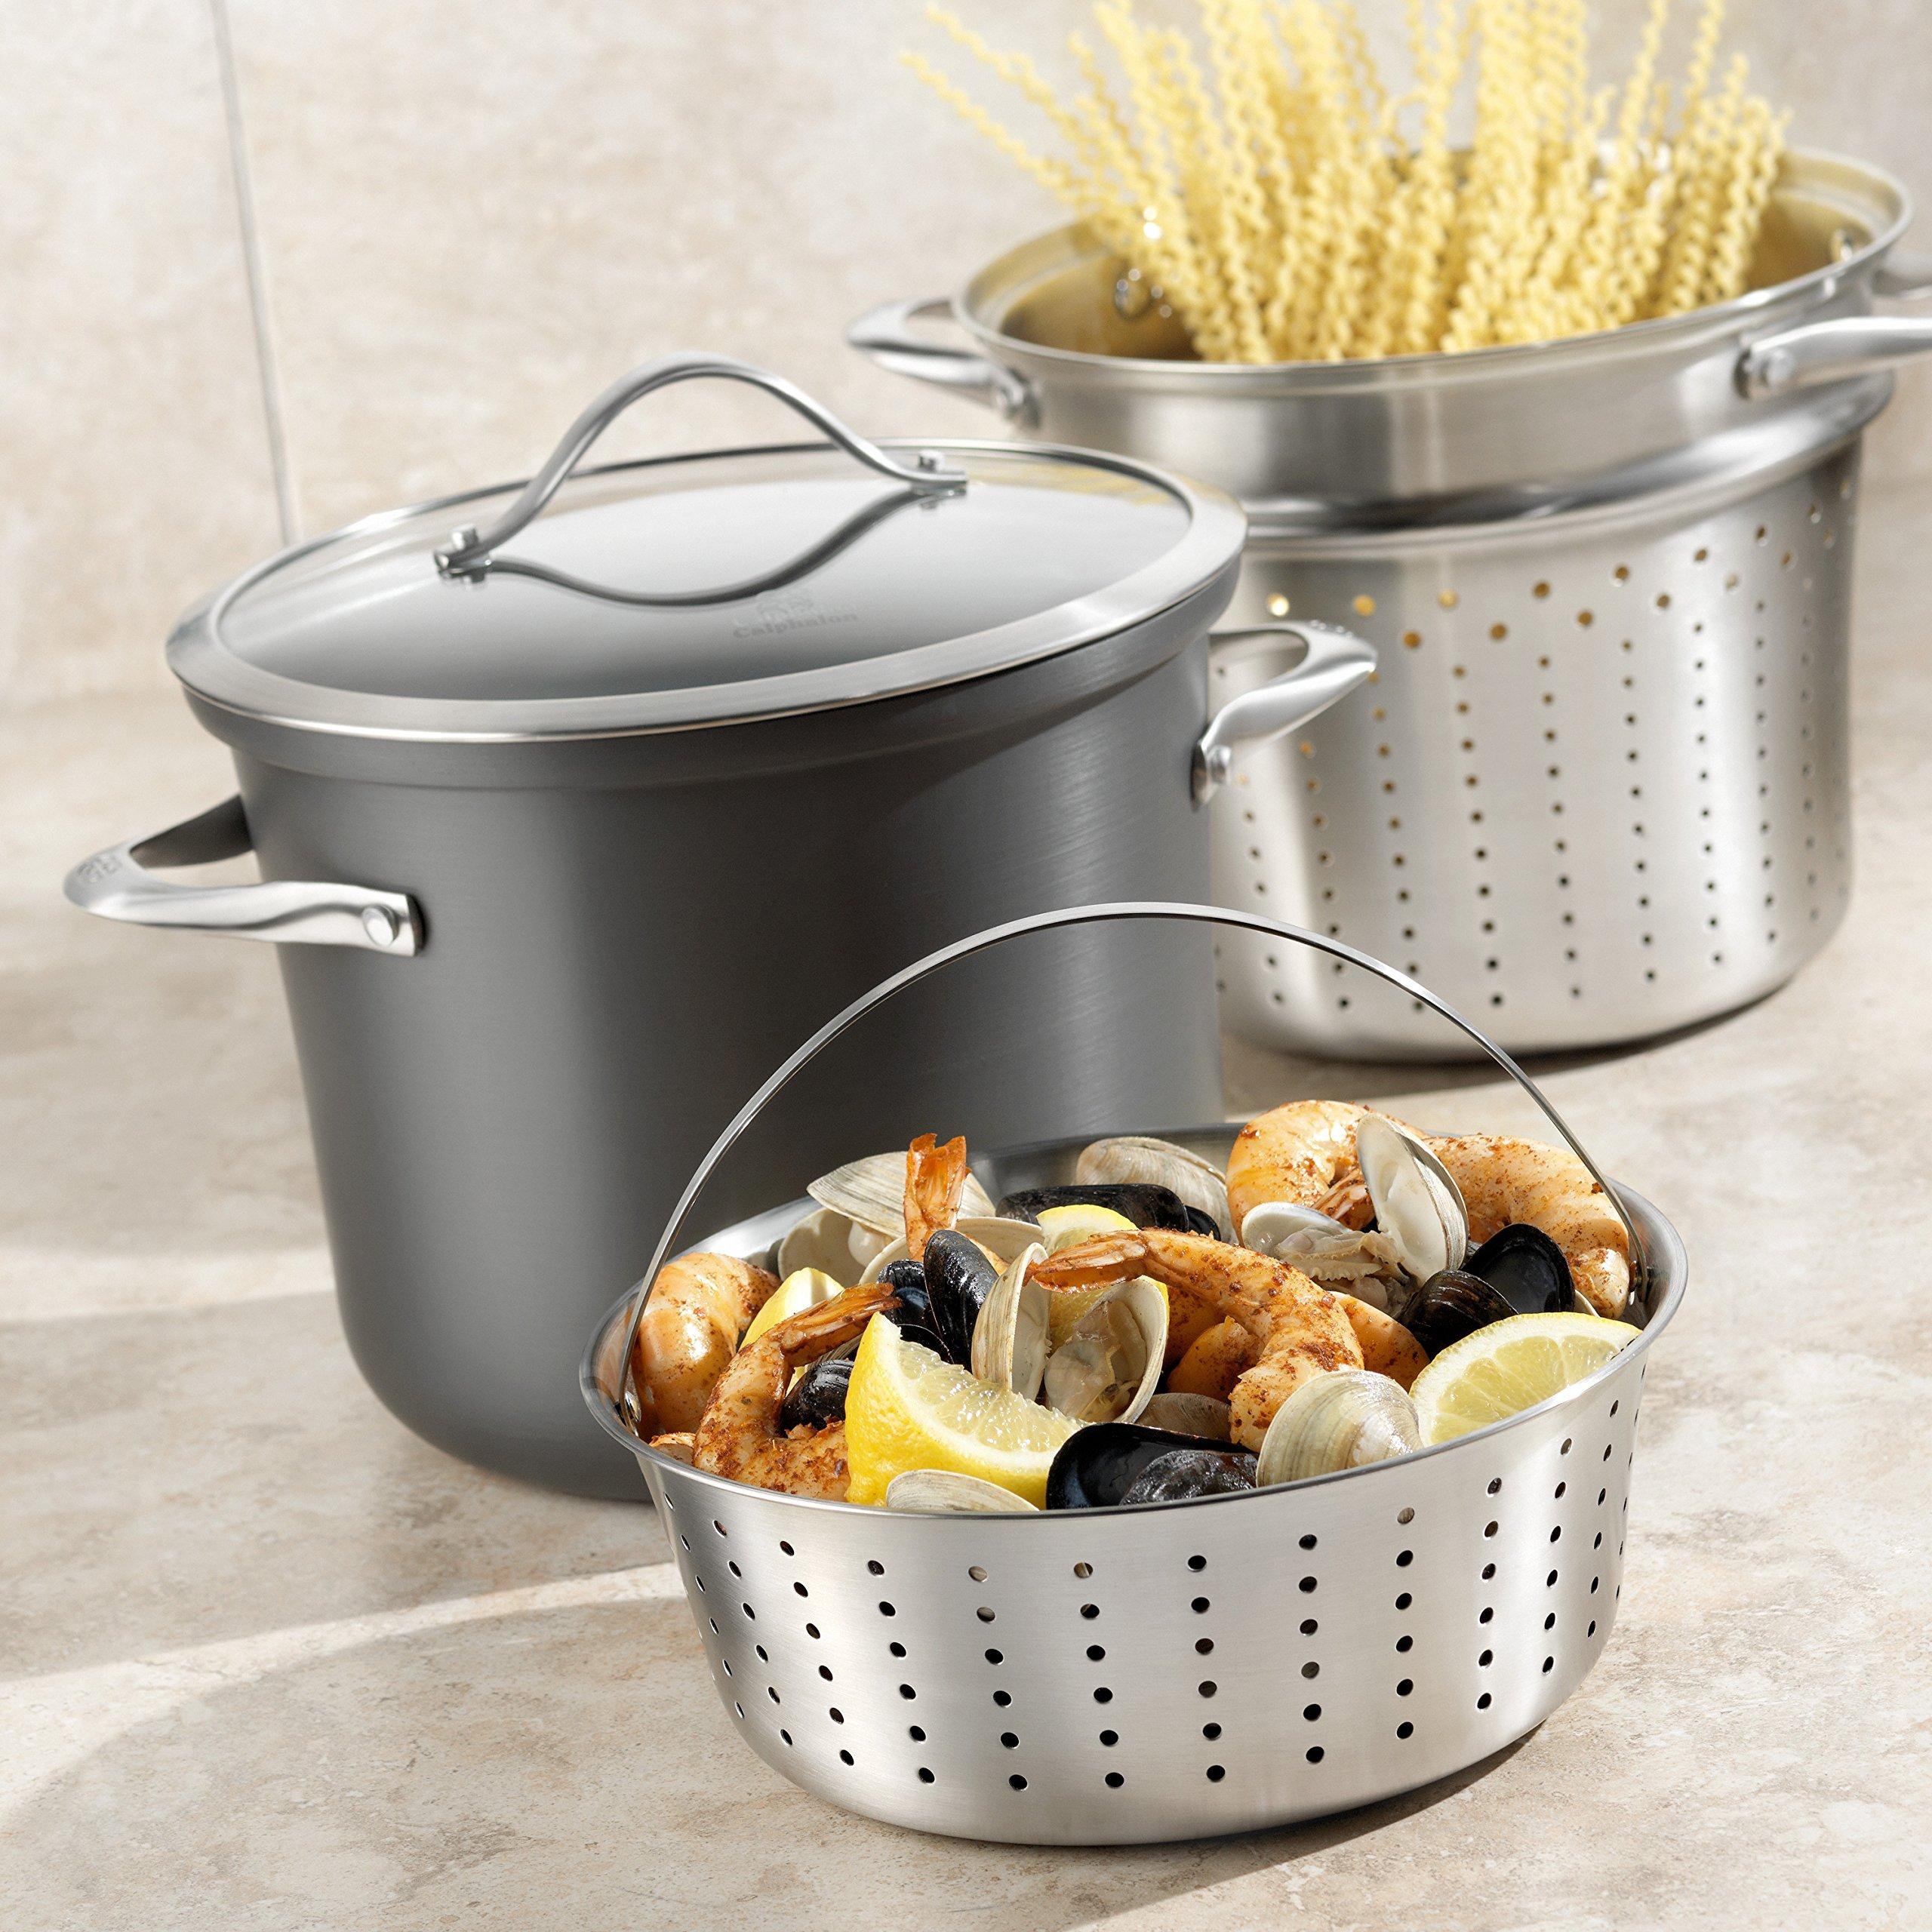 Calphalon Contemporary Hard-Anodized Aluminum Nonstick Cookware, Pasta Pot with Steamer Insert, 8-quart, Black by Calphalon (Image #4)